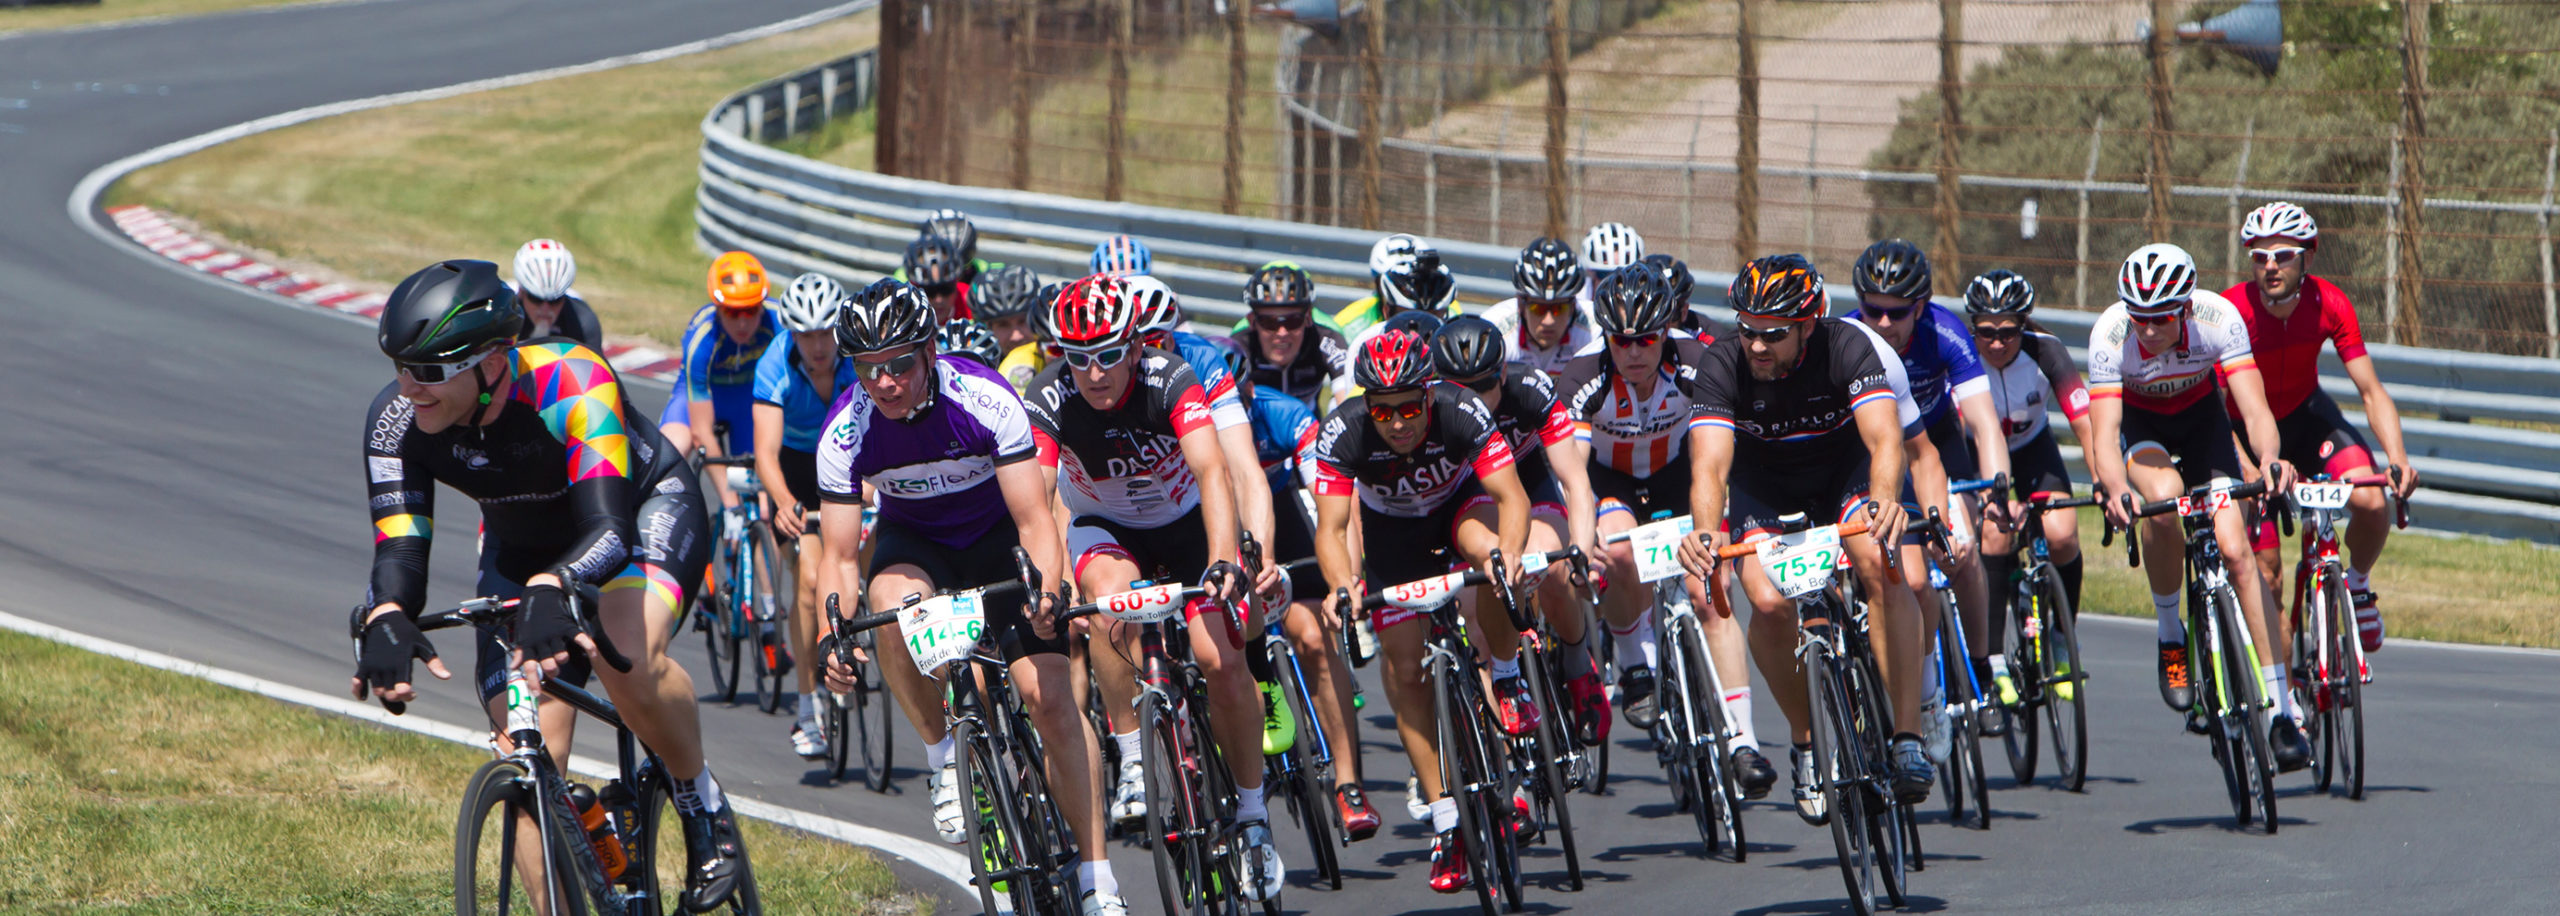 Update Cycling Zandvoort